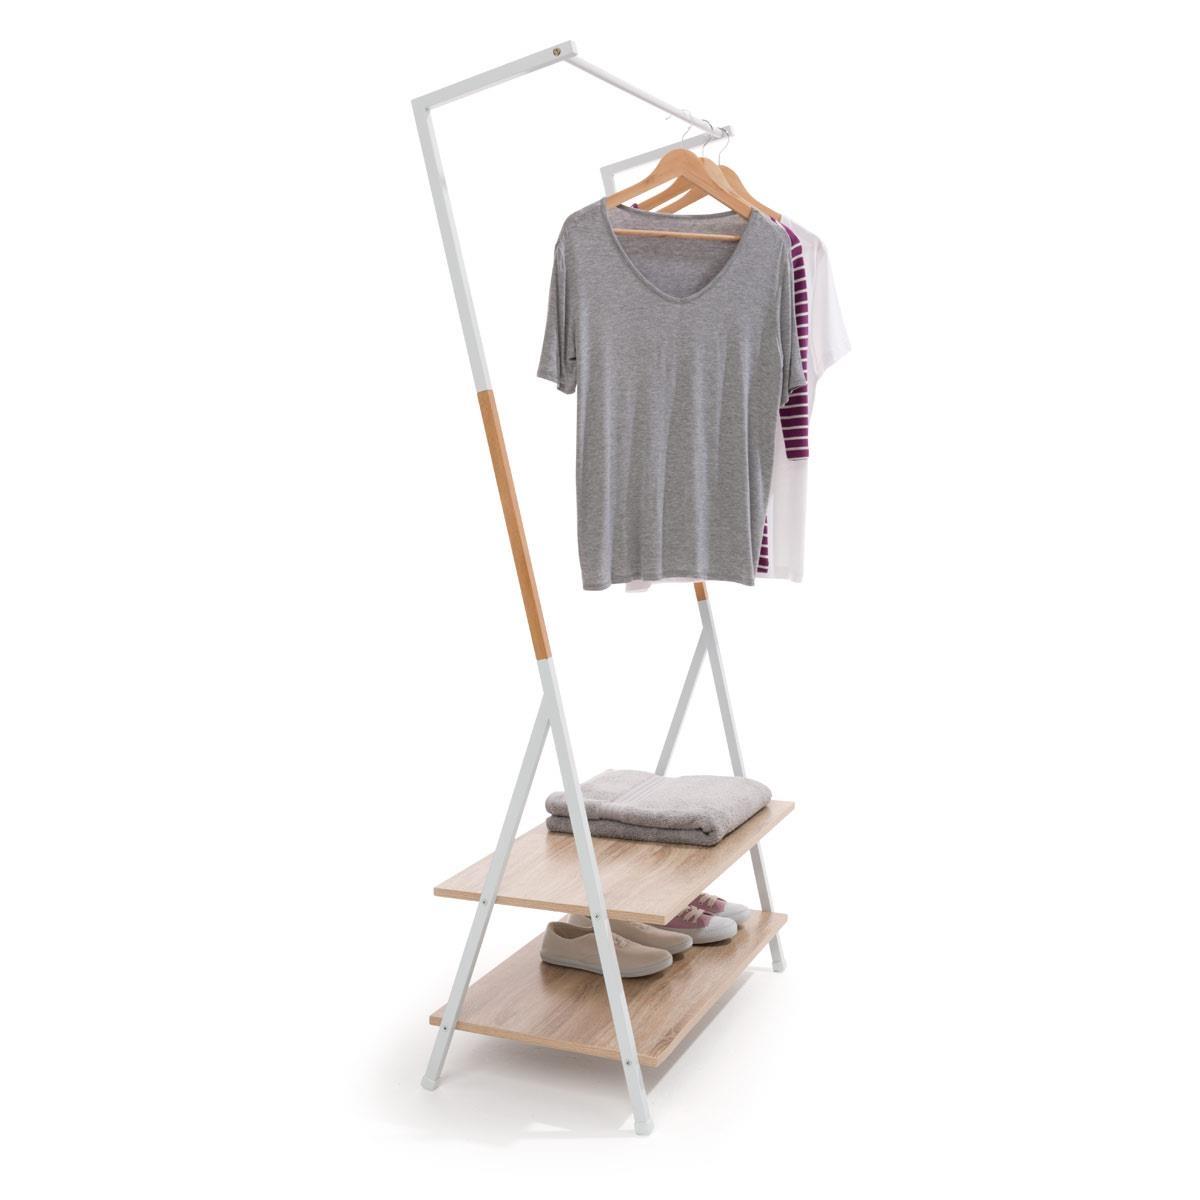 Scandi Garment Rack Kmartnz